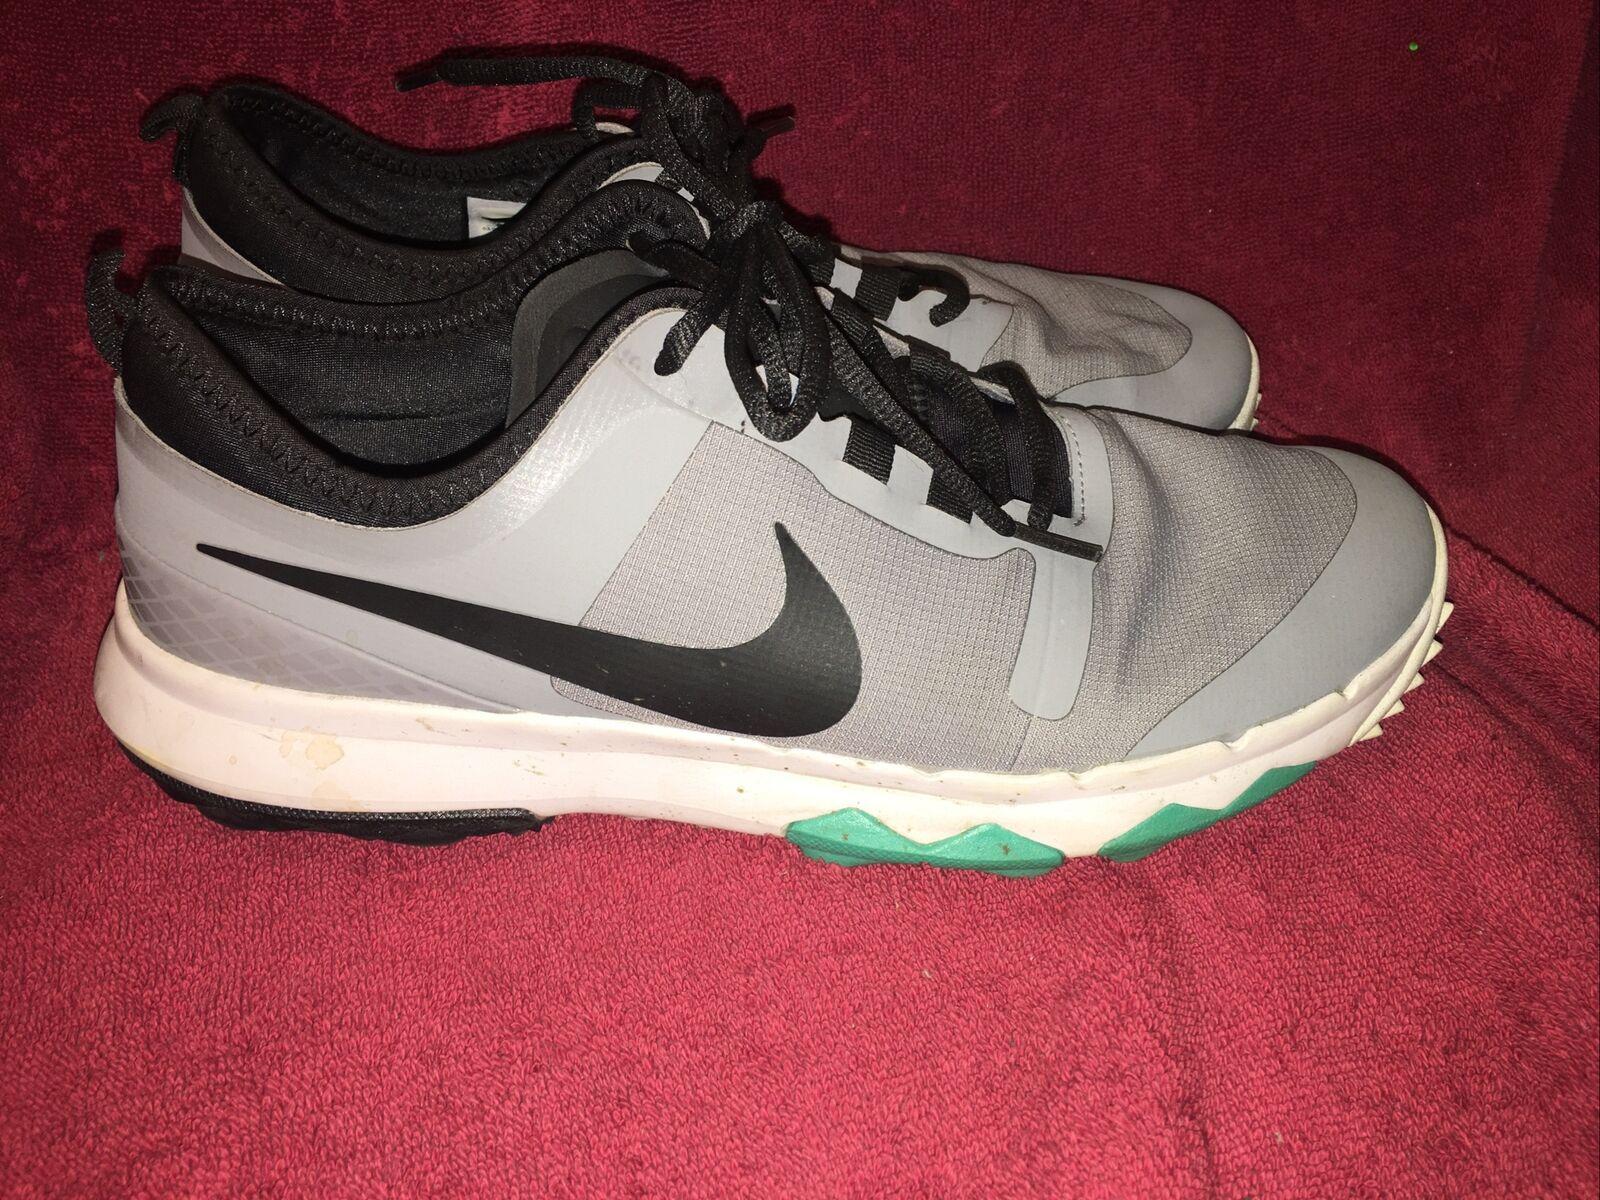 nike men's f1 impact golf shoes